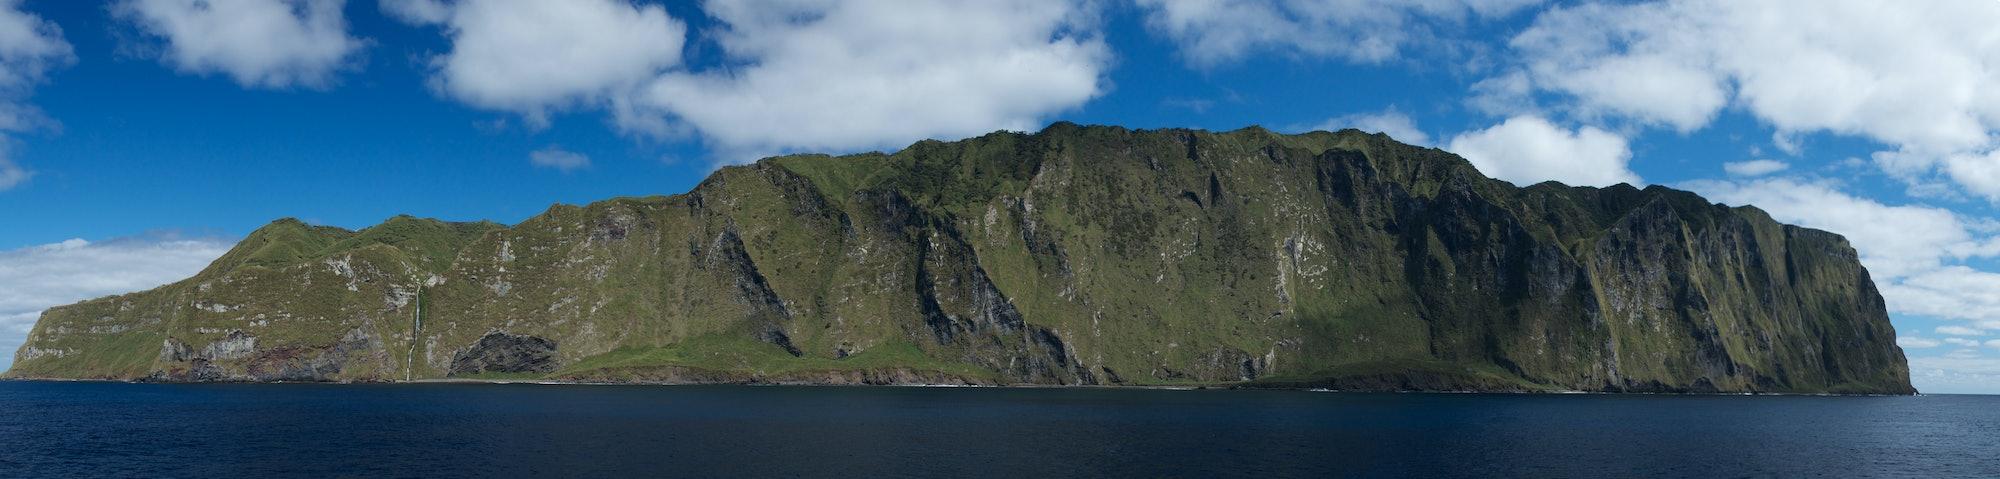 Inaccessible Island Panorama (Large)